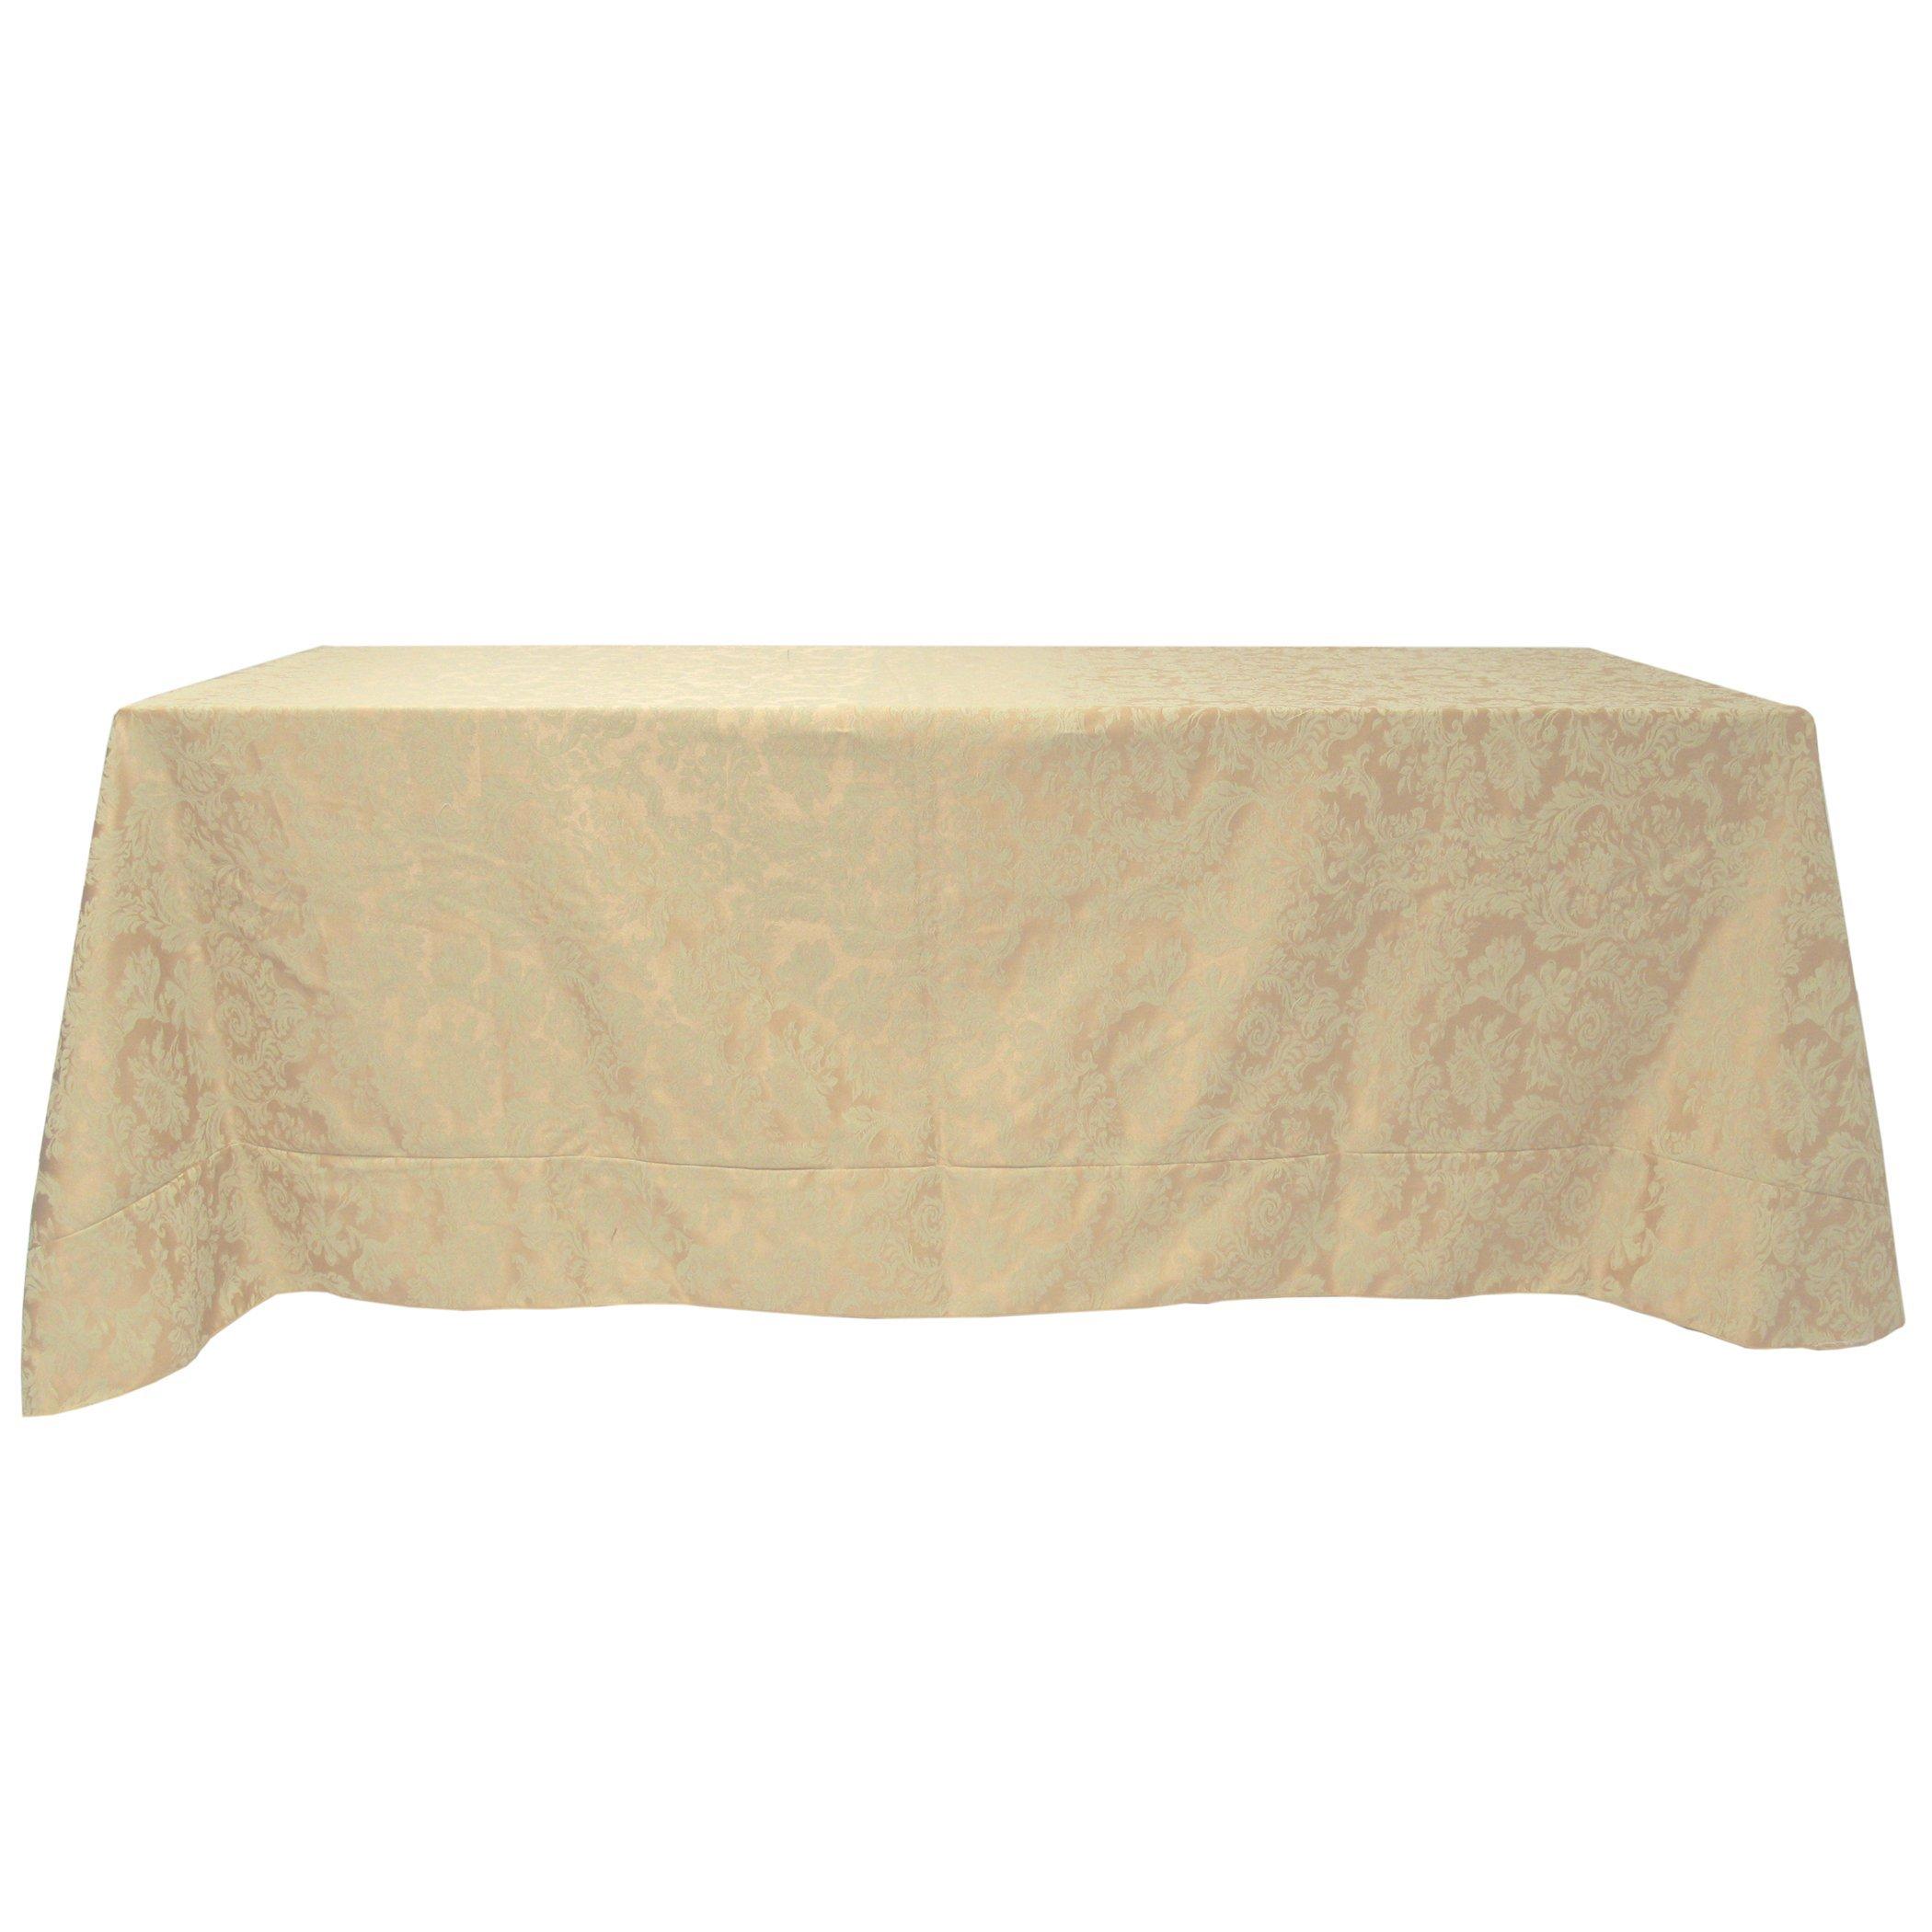 Ultimate Textile Miranda 108 x 156-Inch Rectangular Damask Tablecloth Champagne Ivory Cream